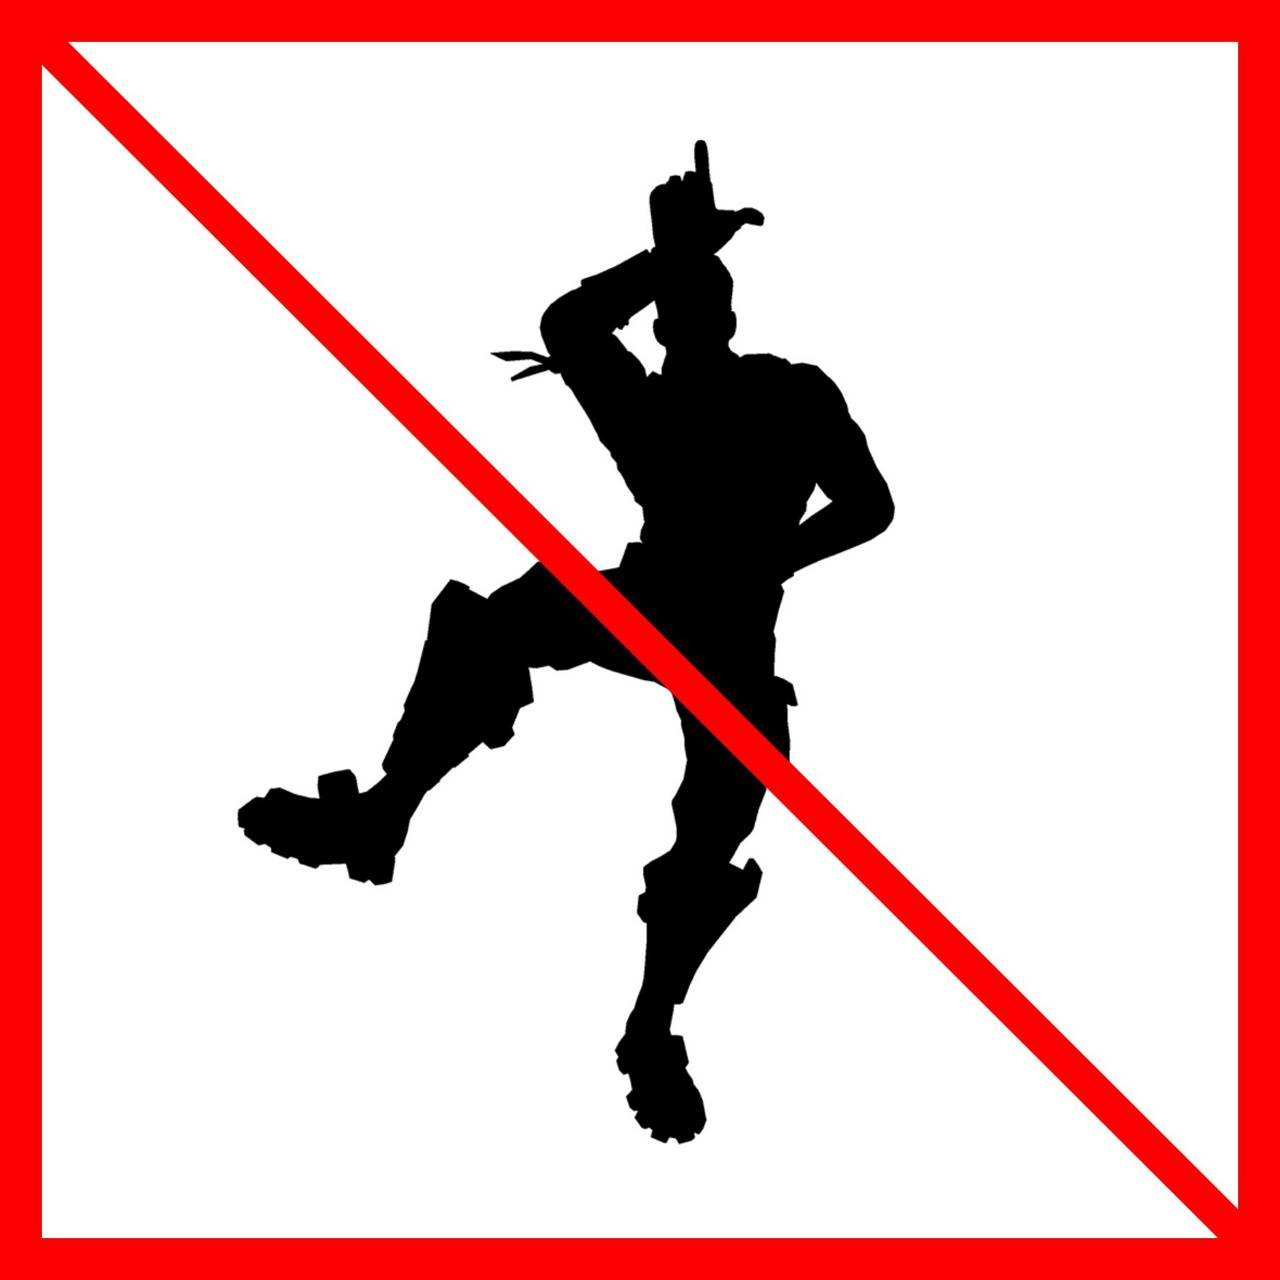 No Dance please